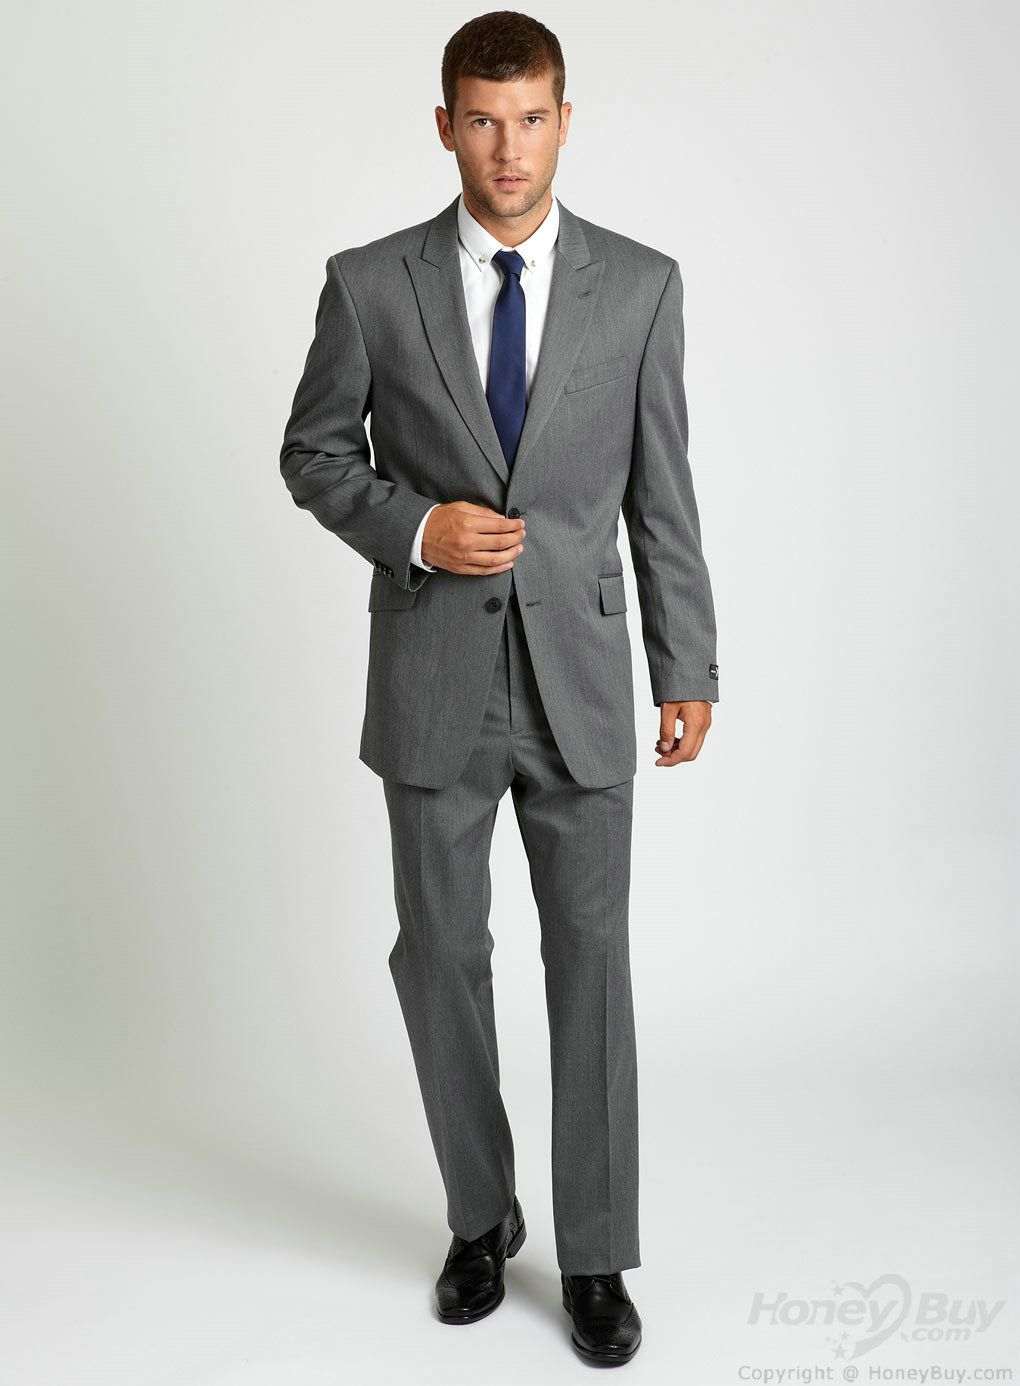 Mens Wedding Suits Grey - Ocodea.com